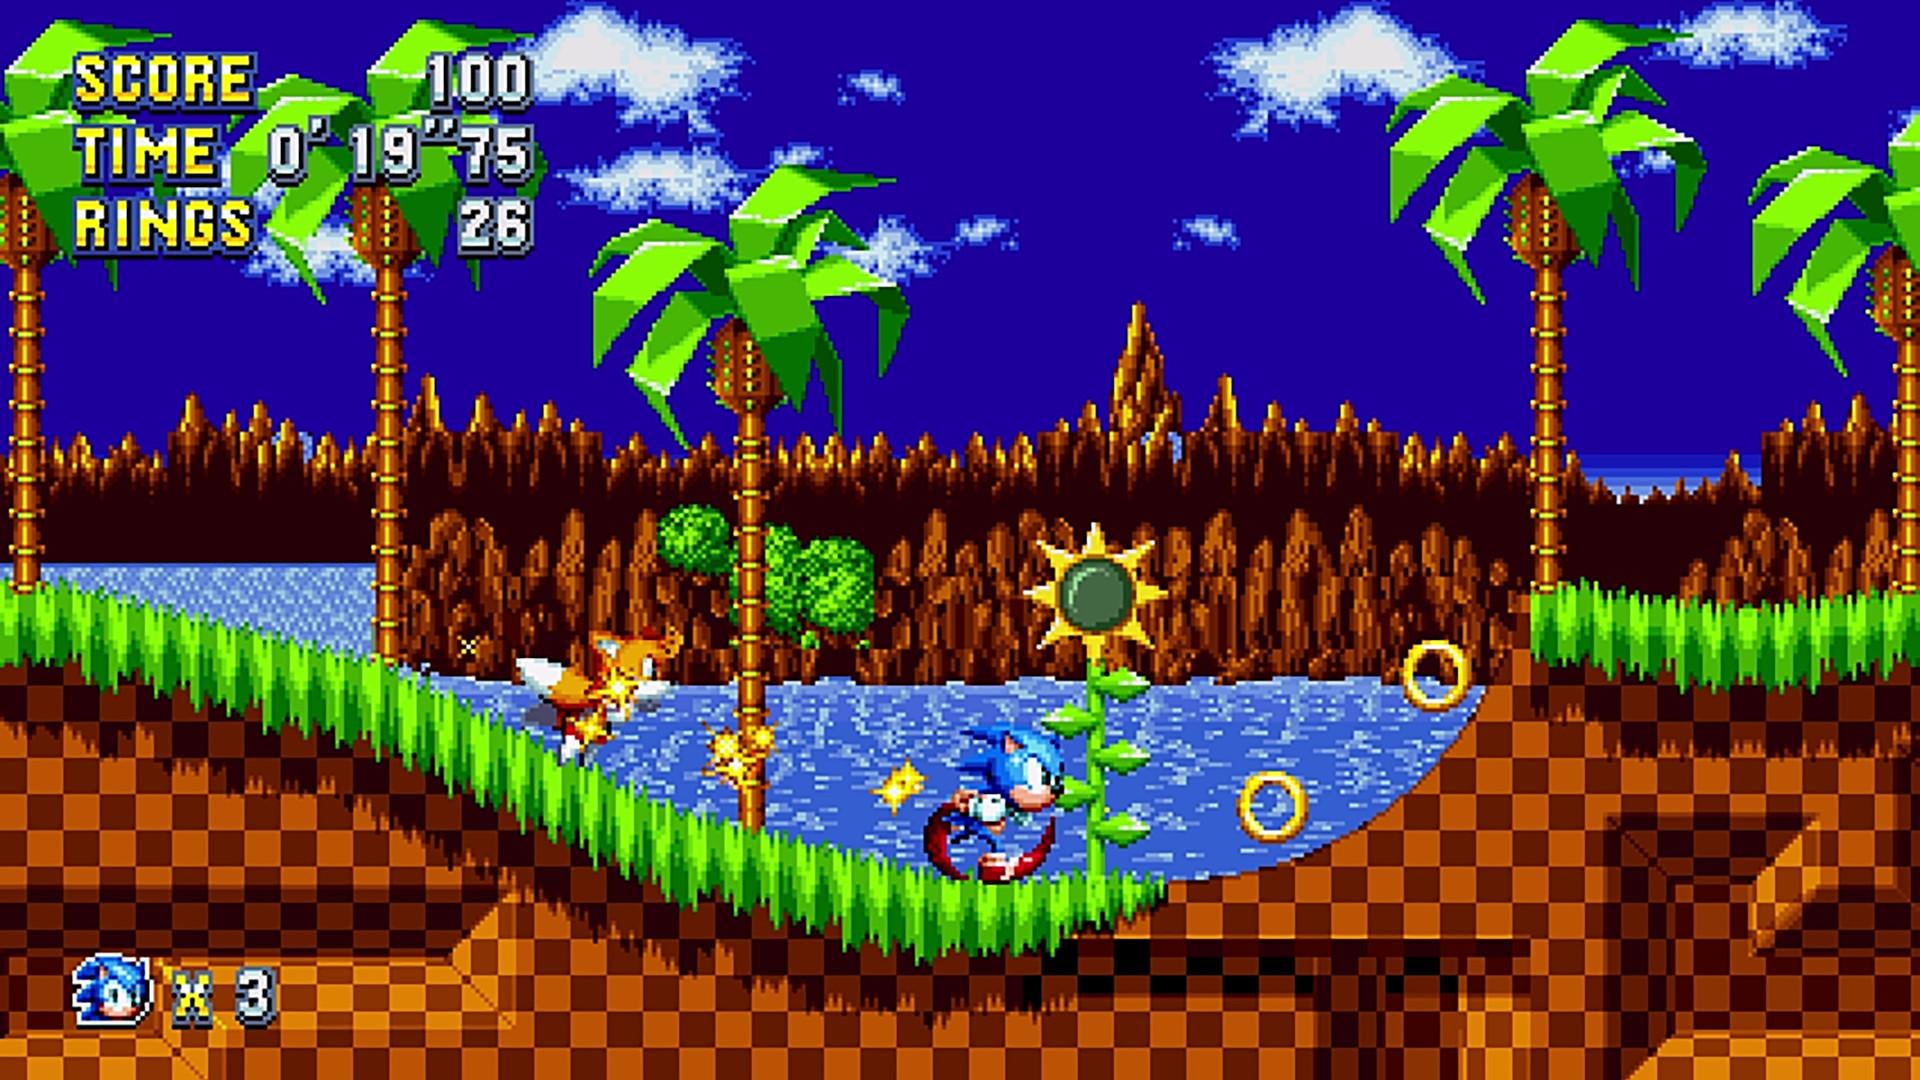 Sonic Mania image 1